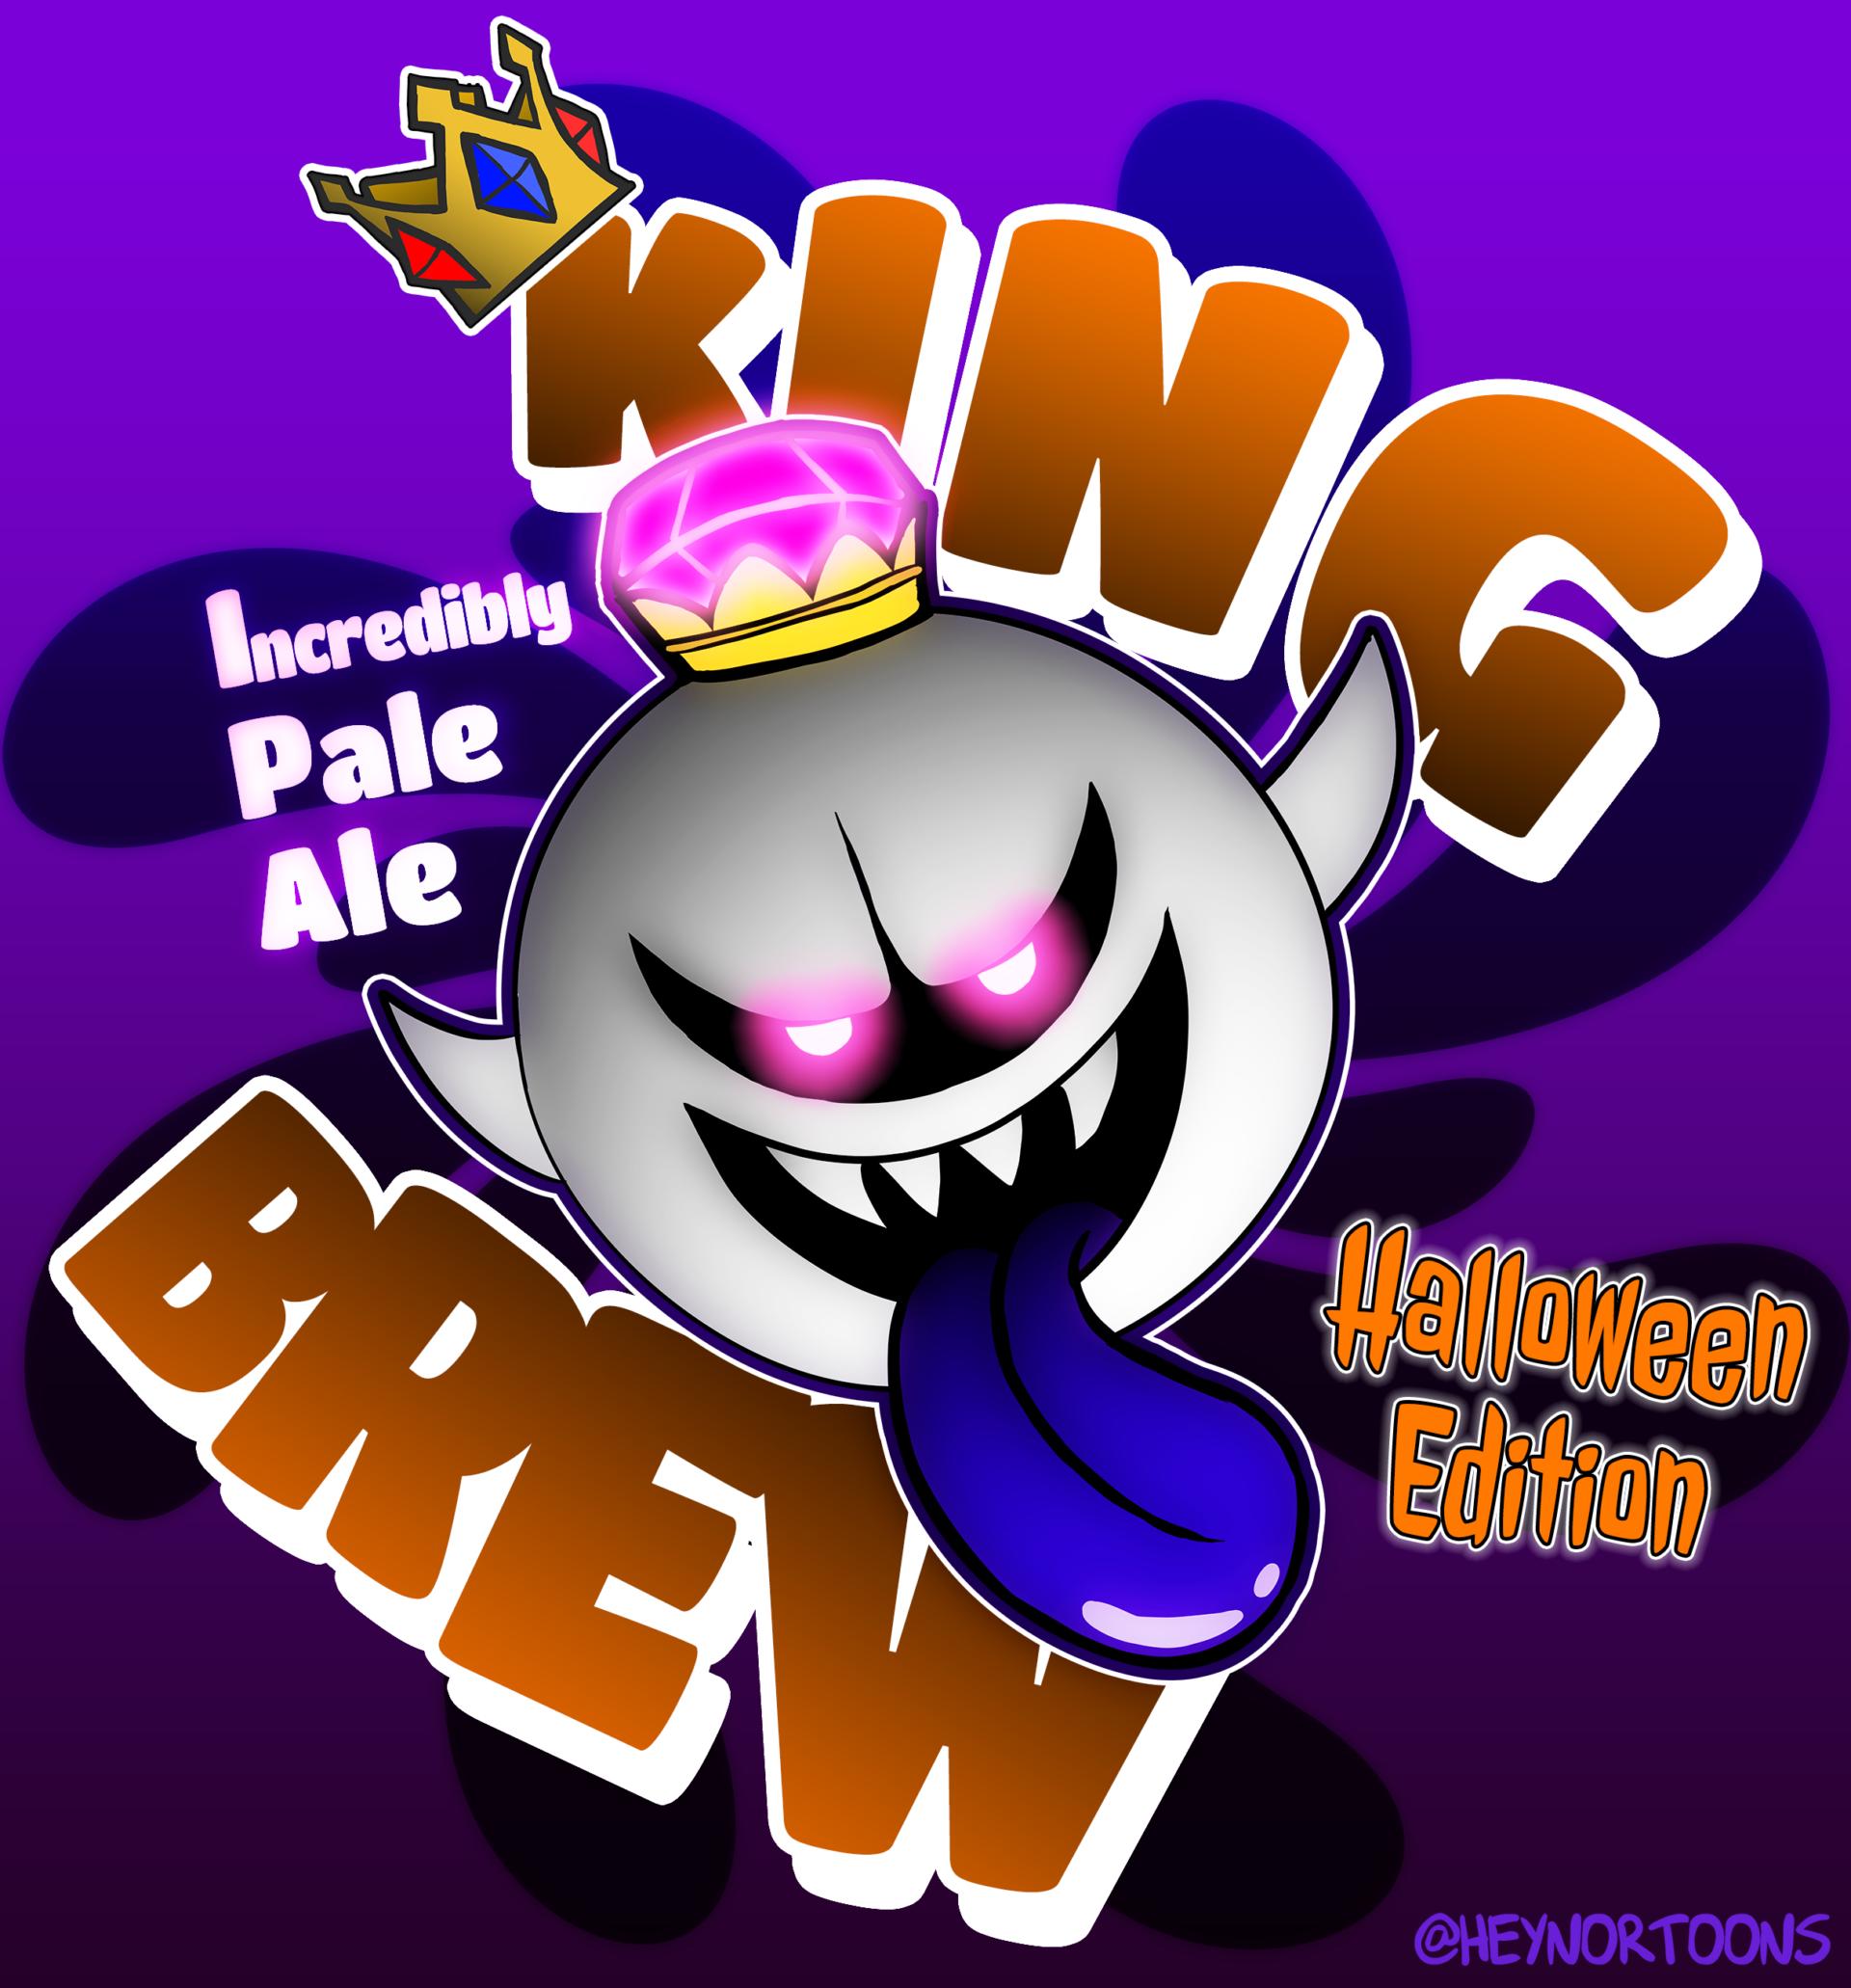 King Boo IPA (Incredibly Pale Ale) - Halloween Edition